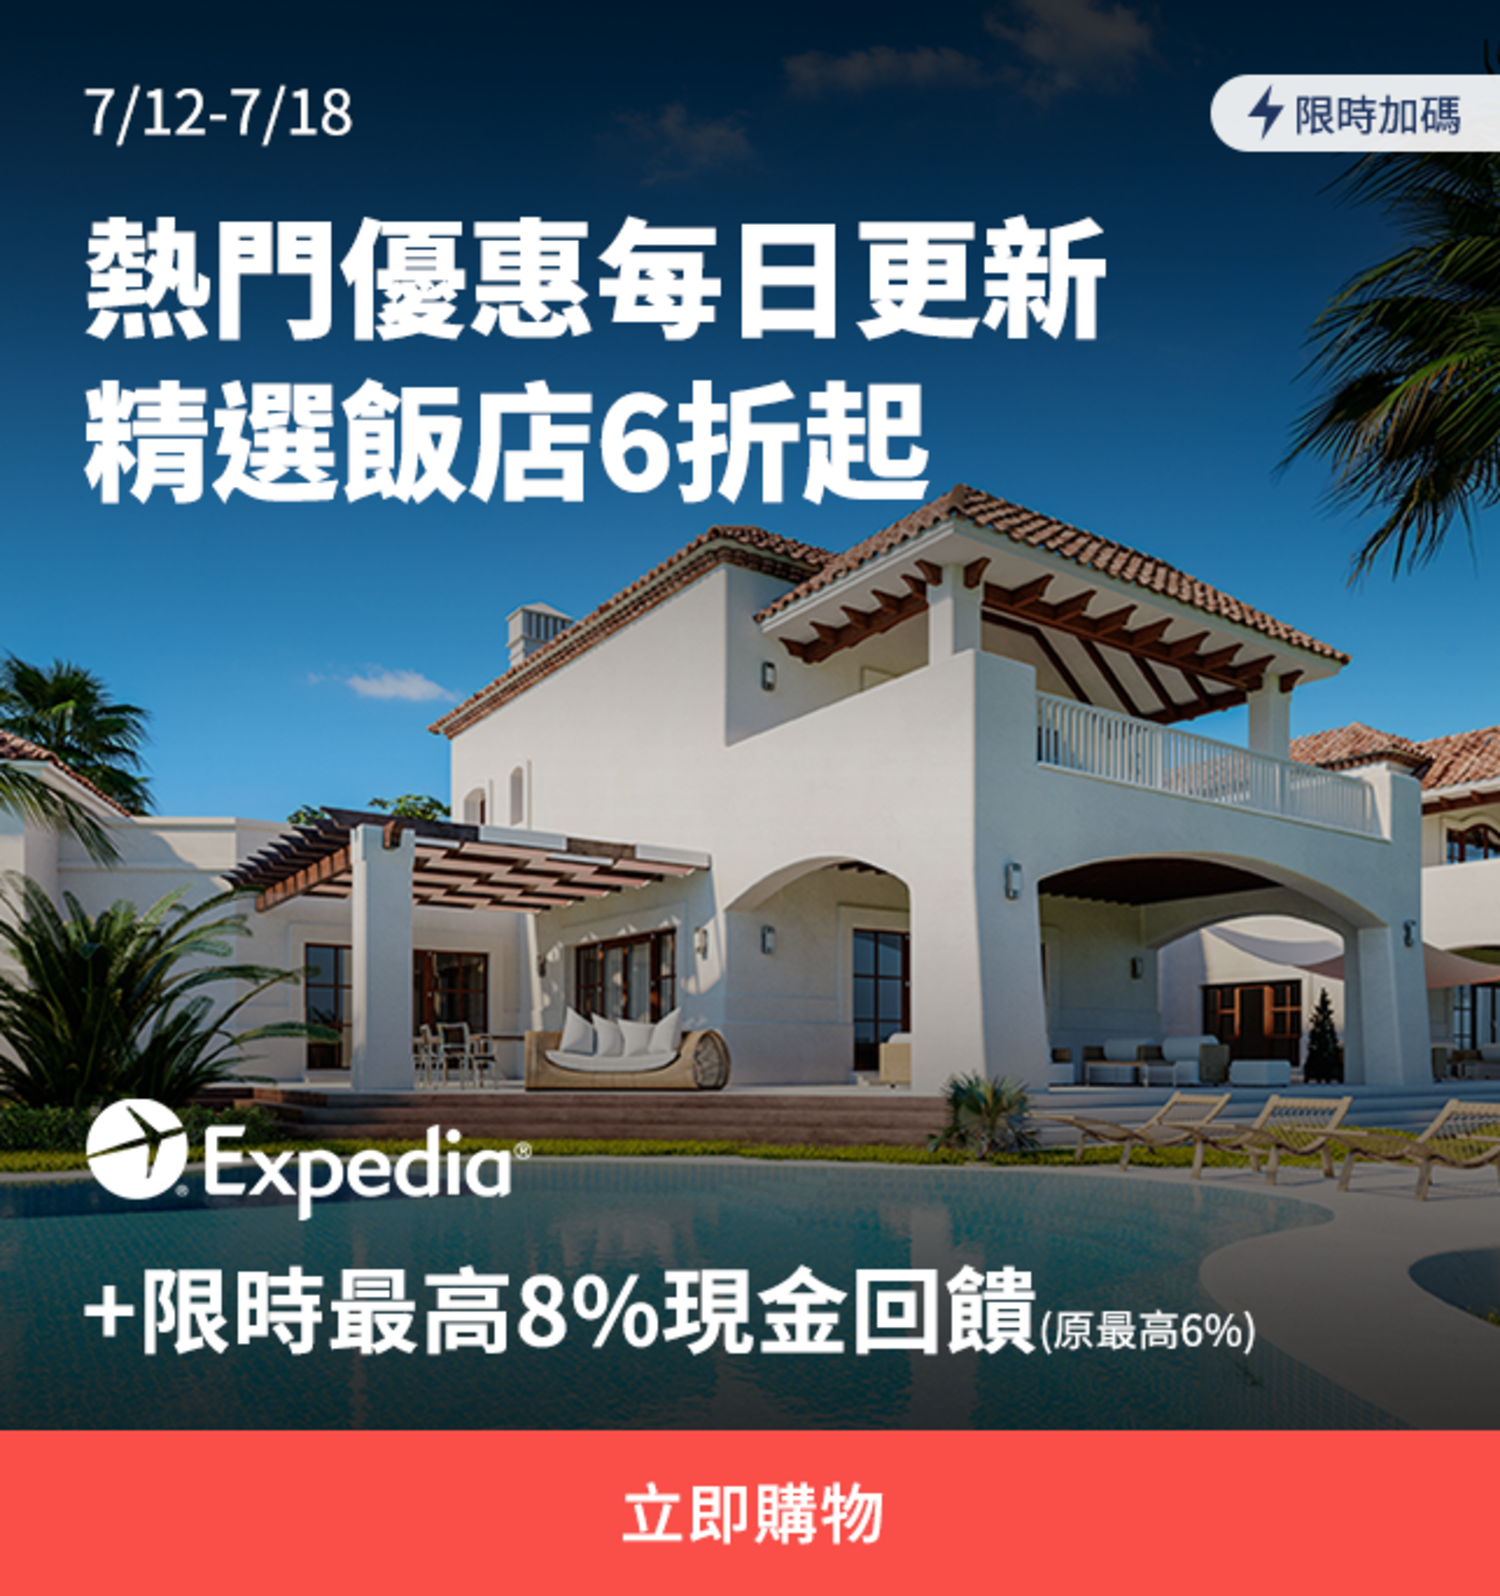 expedia 加碼最高8% 0712-0718